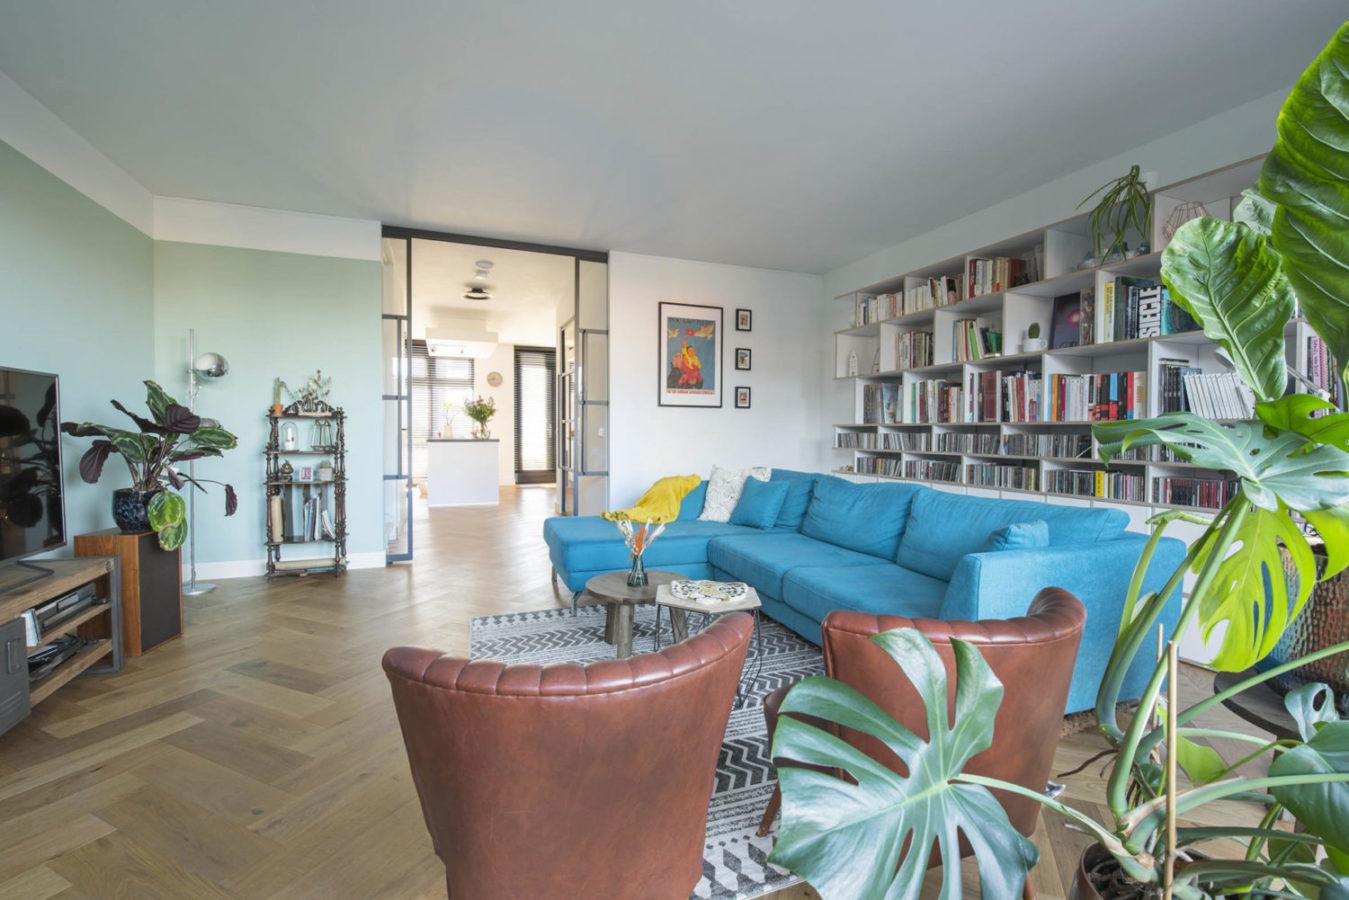 Woonkamer Teteringen interieurontwerp interieuradvies breda styling binnenhuisarchitect